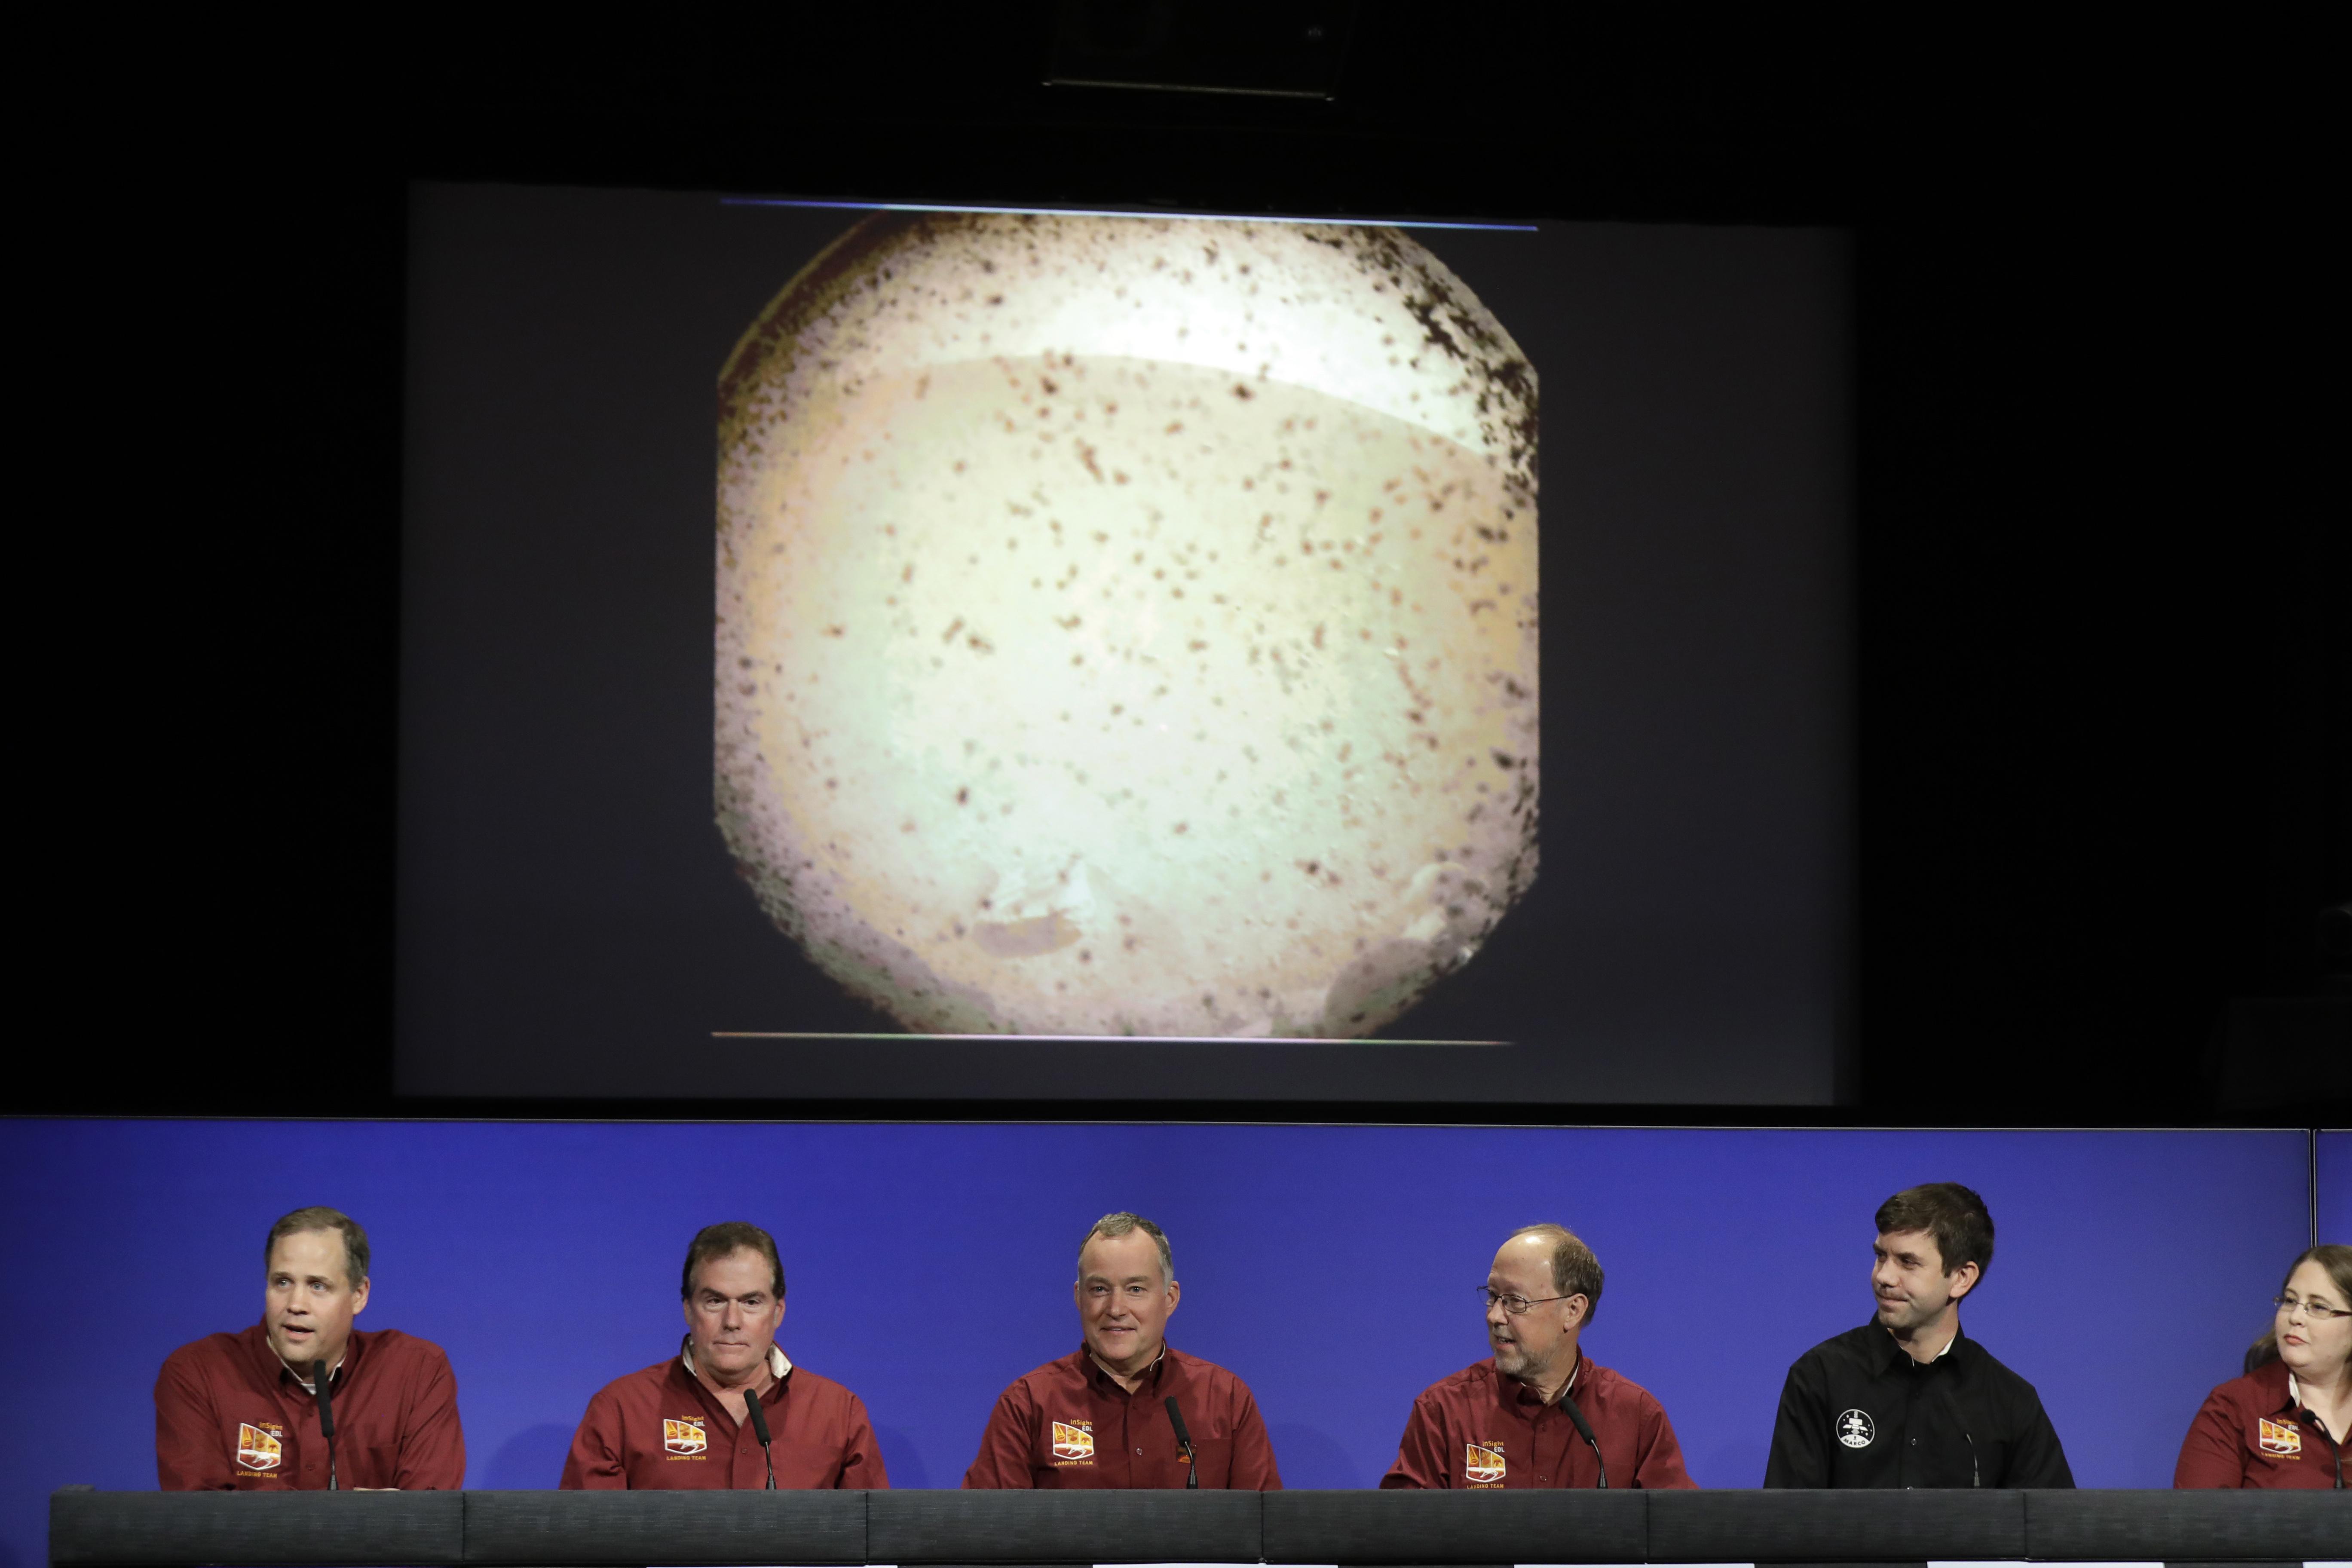 Mars Touchdown Nasa Spacecraft Survives Supersonic Plunge Dont Infrared Video Of A Hovering Lander From Left Officials Jim Bridenstine Michael Watkins Tom Hoffman Bruce Banerdt